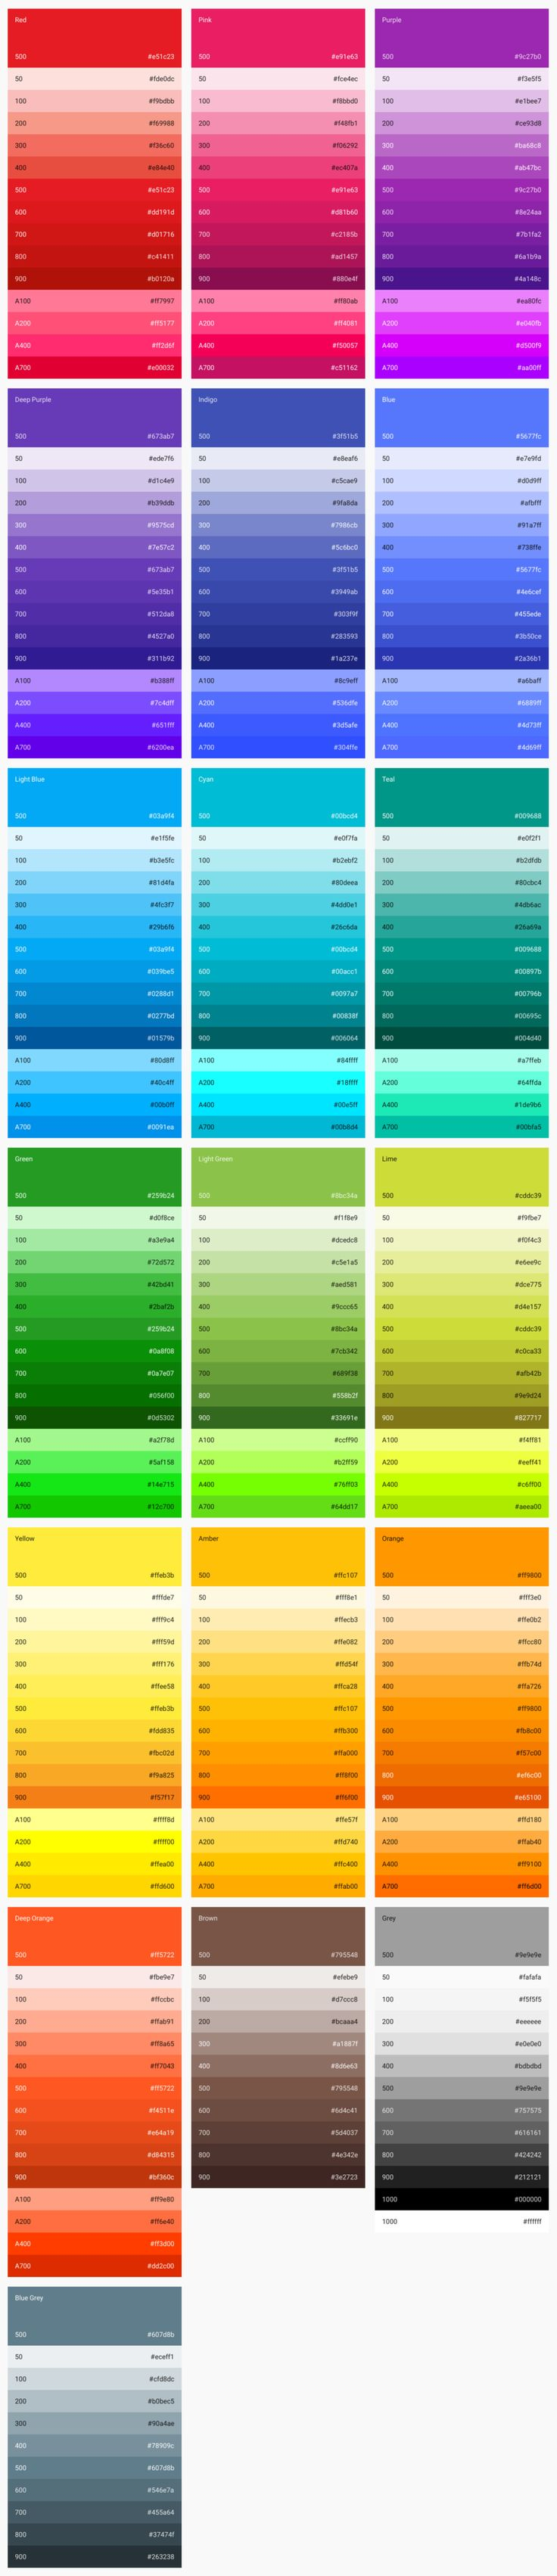 Material Design - Style - Color-UI中国-专业界面设计平台